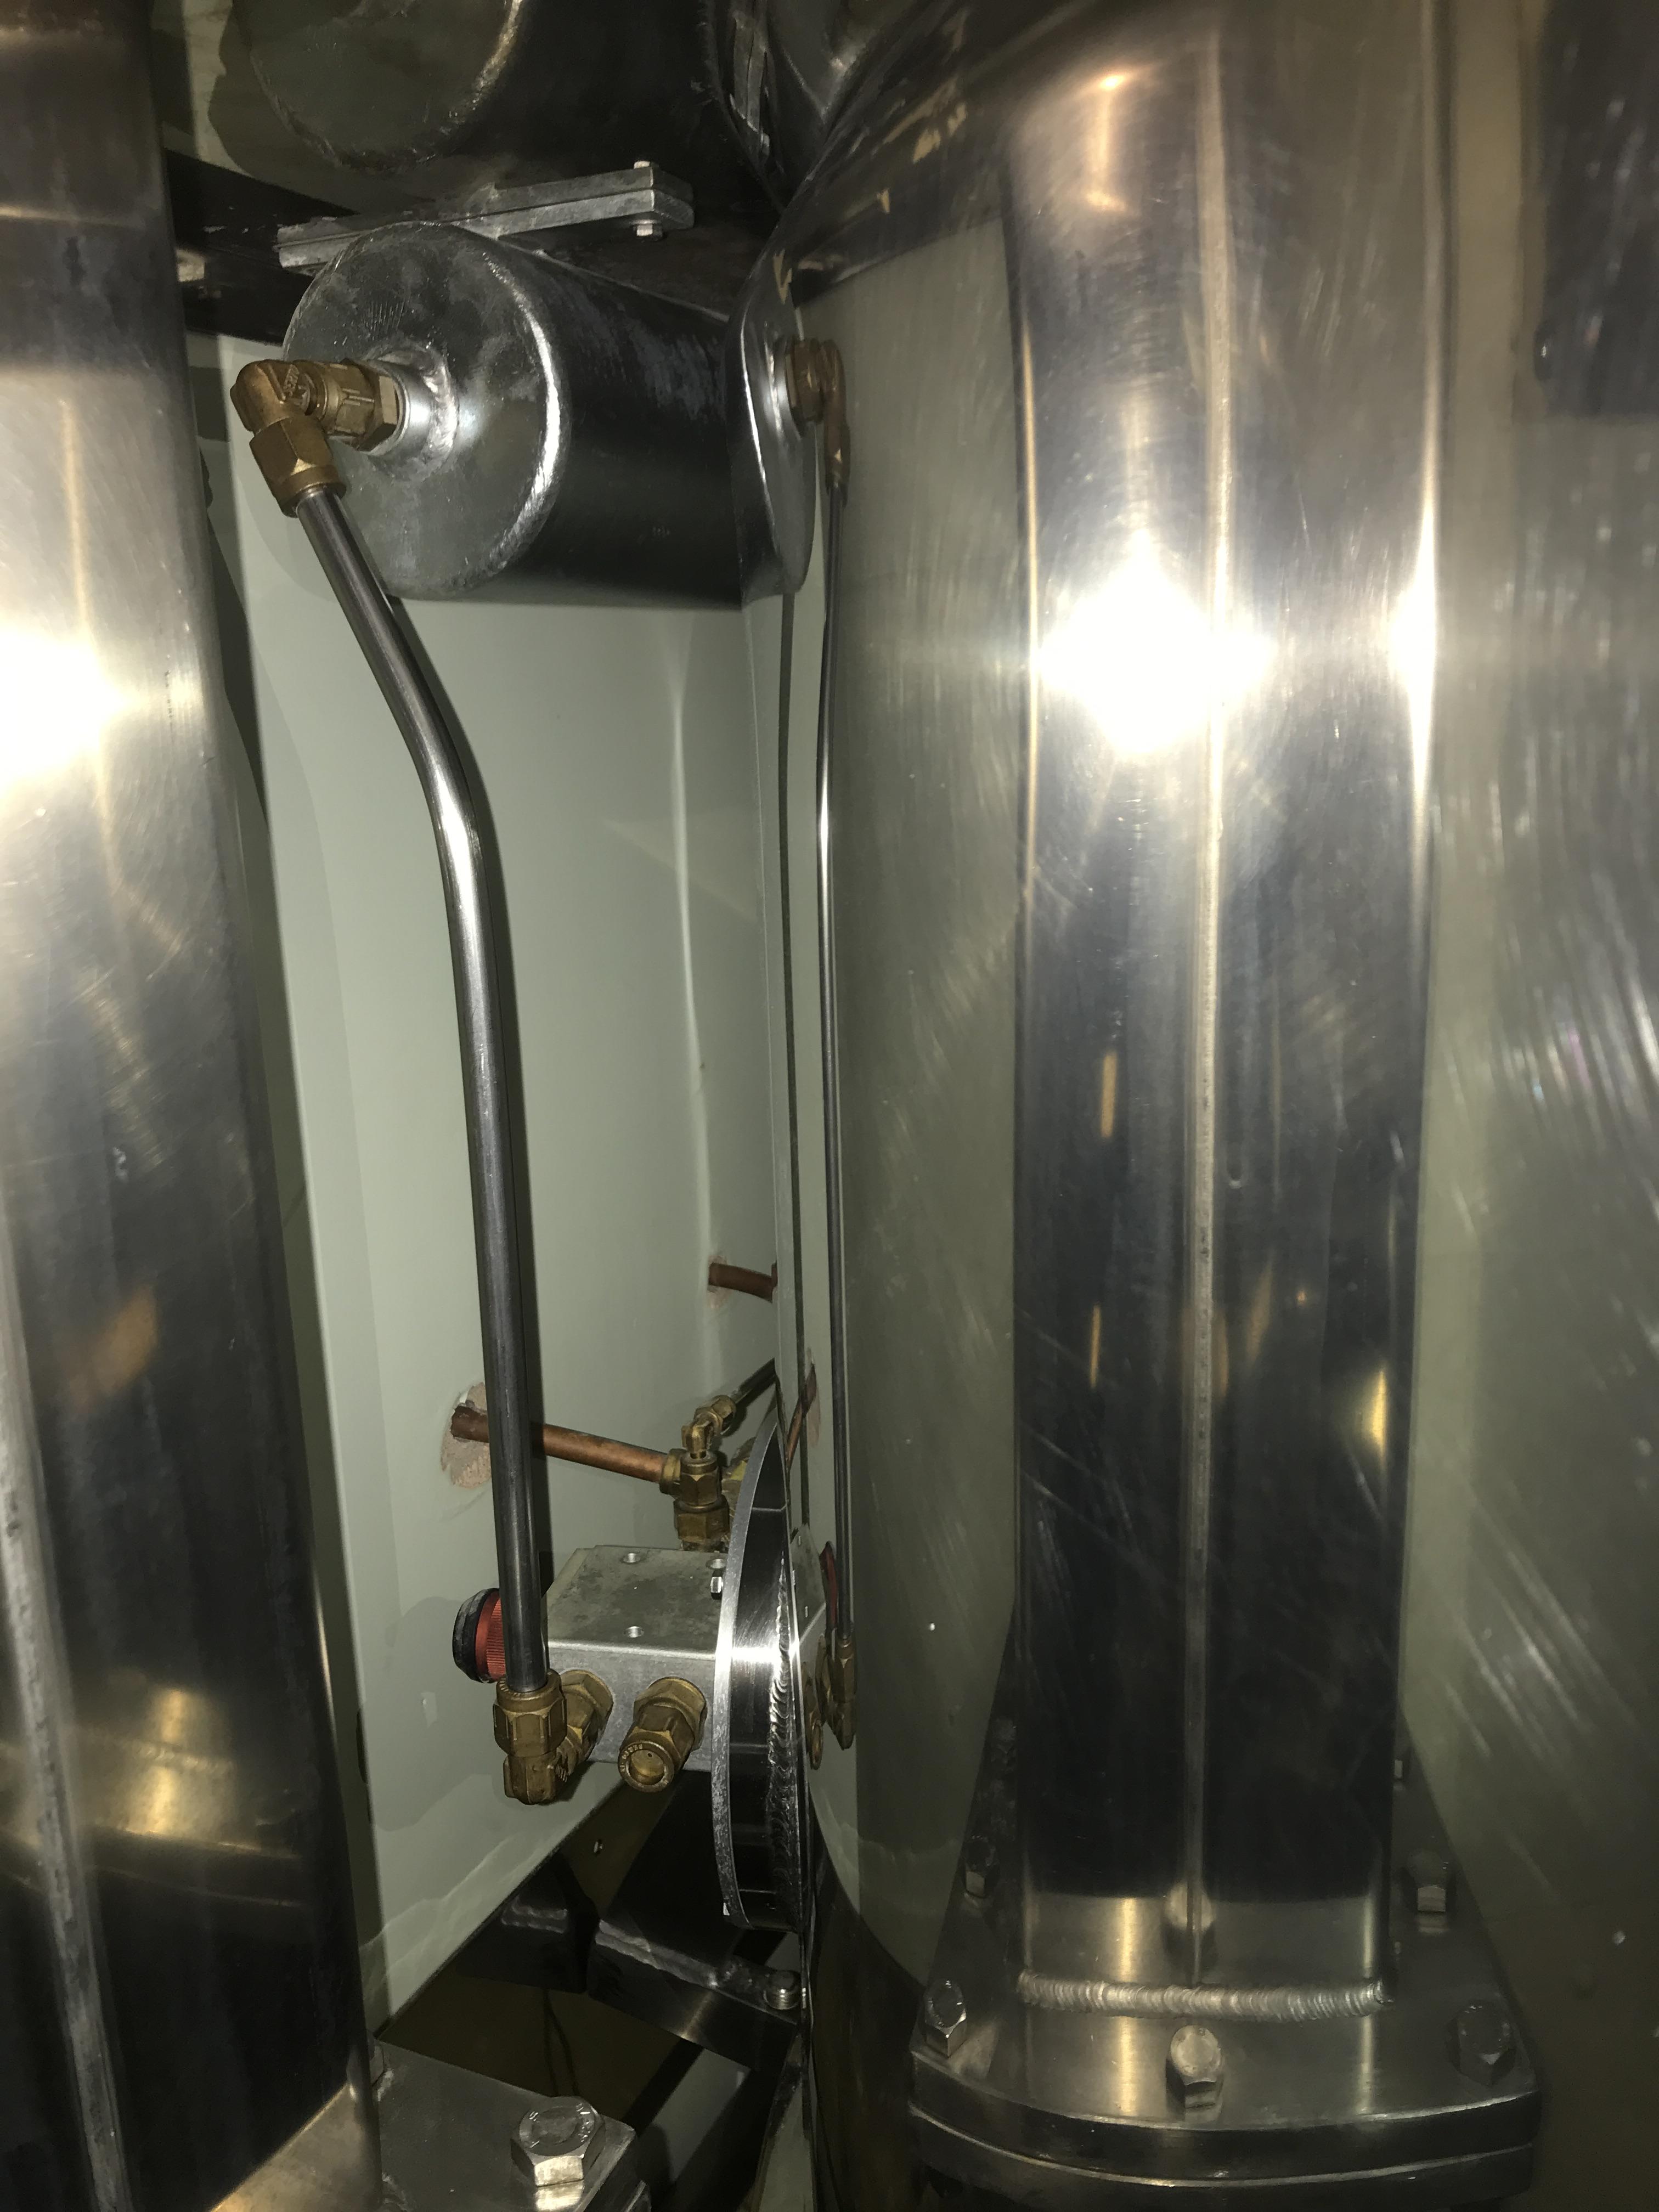 Aeromatic GEA Granulatore Miscelatore PMA 300 - Essiccatore a letto fluido T5 Linea Completa Aeromatic GEA